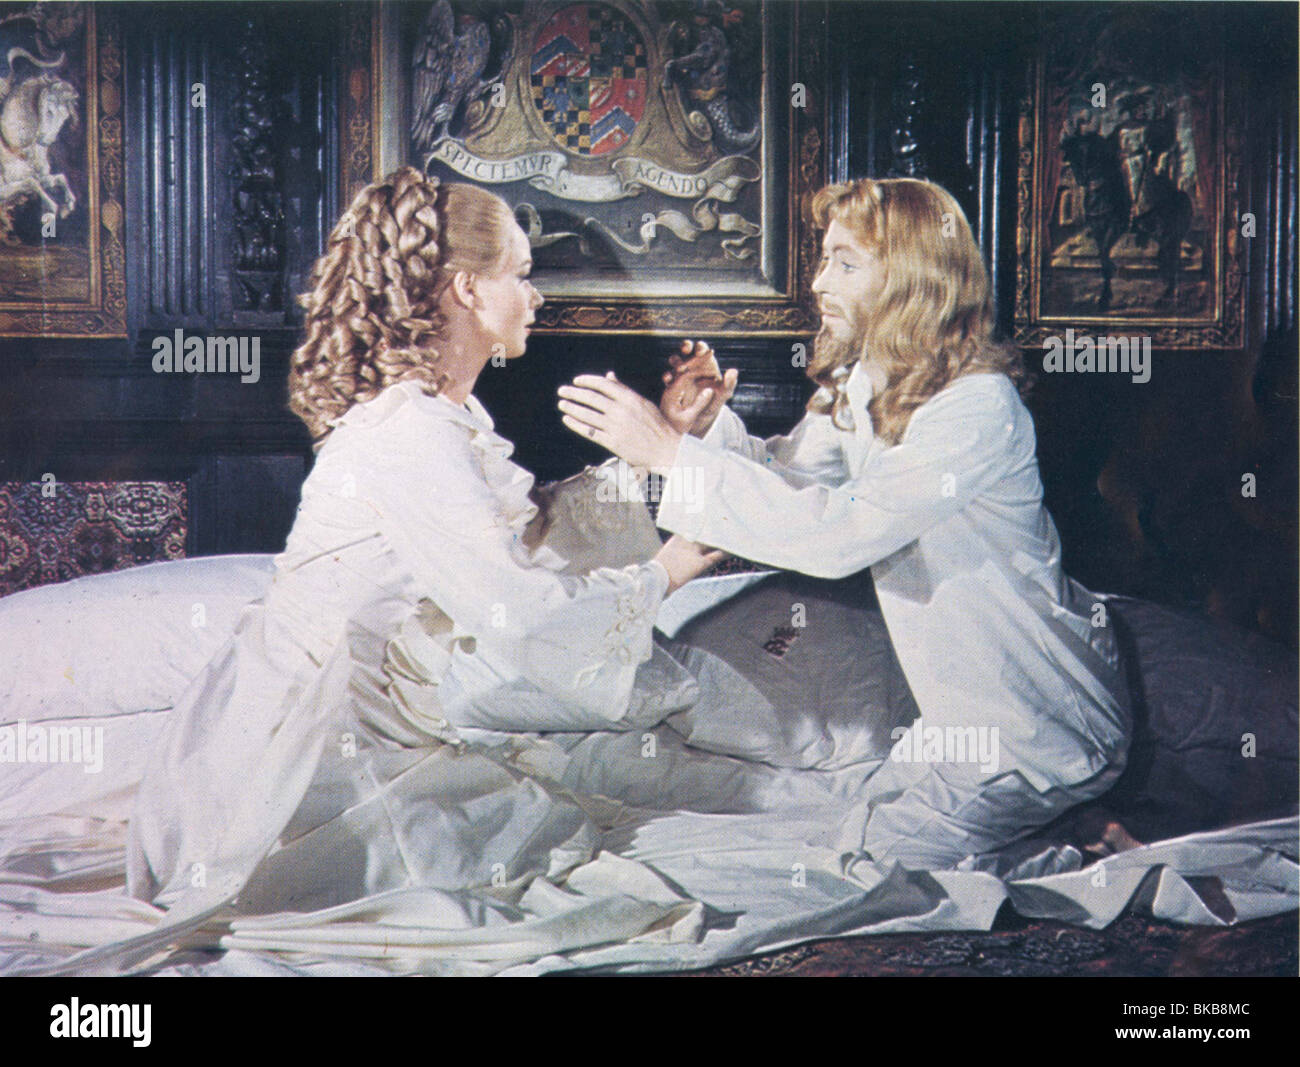 Cassi Davis,Hermione Corfield (born 1993) XXX nude Ruby Moreno (b. 1965),Jourdan Dunn GBR 3 2012?014